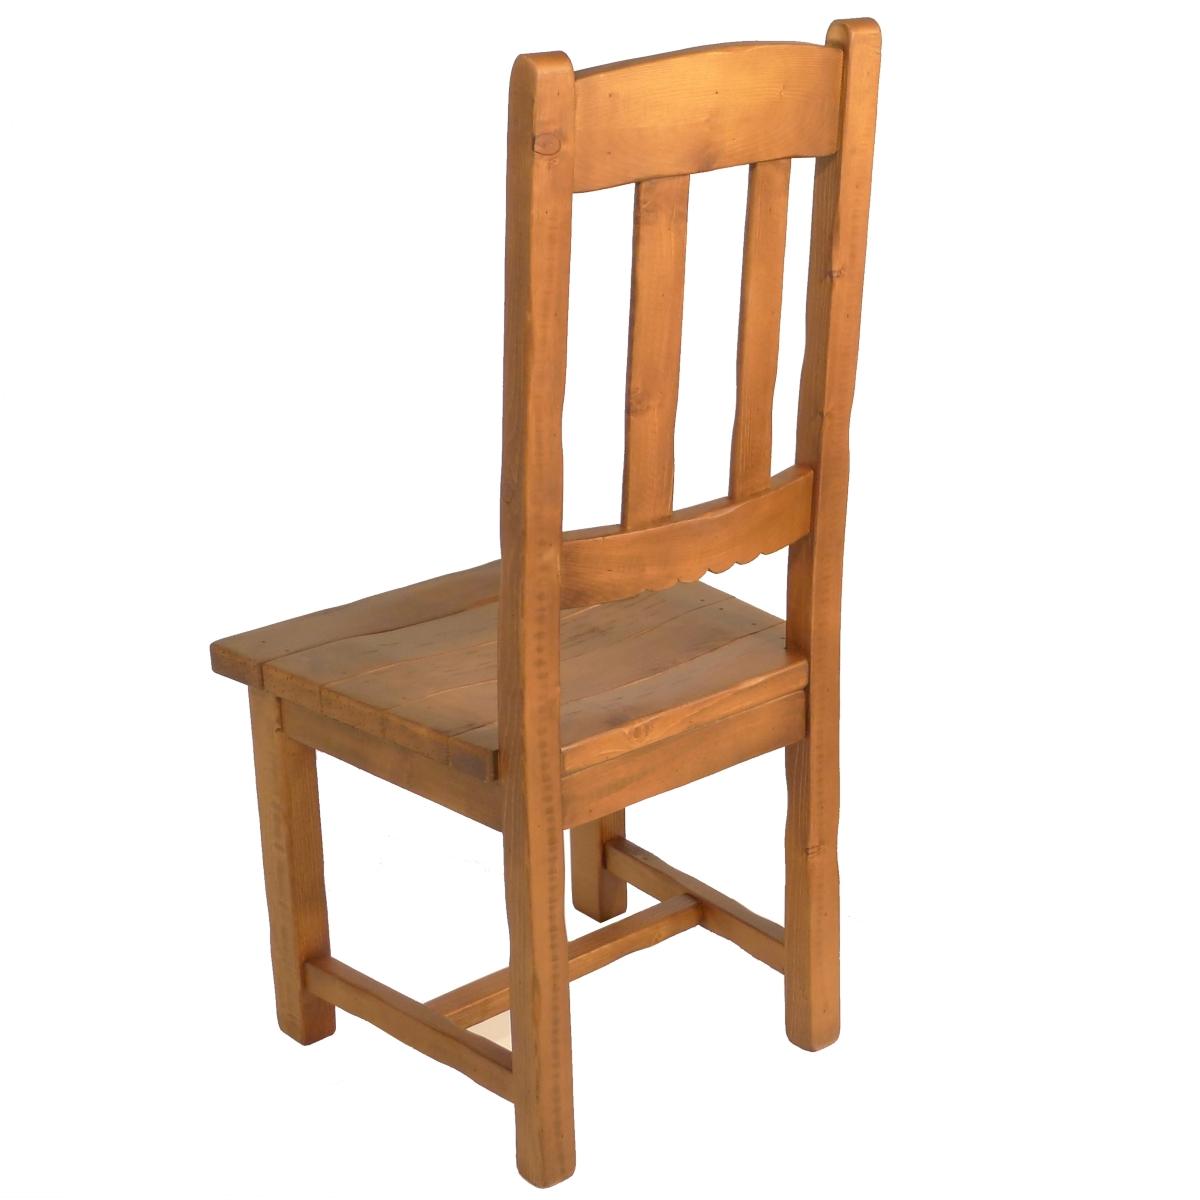 Silla alta r stica asiento de madera ecor stico venta de for Sillas de escritorio altas